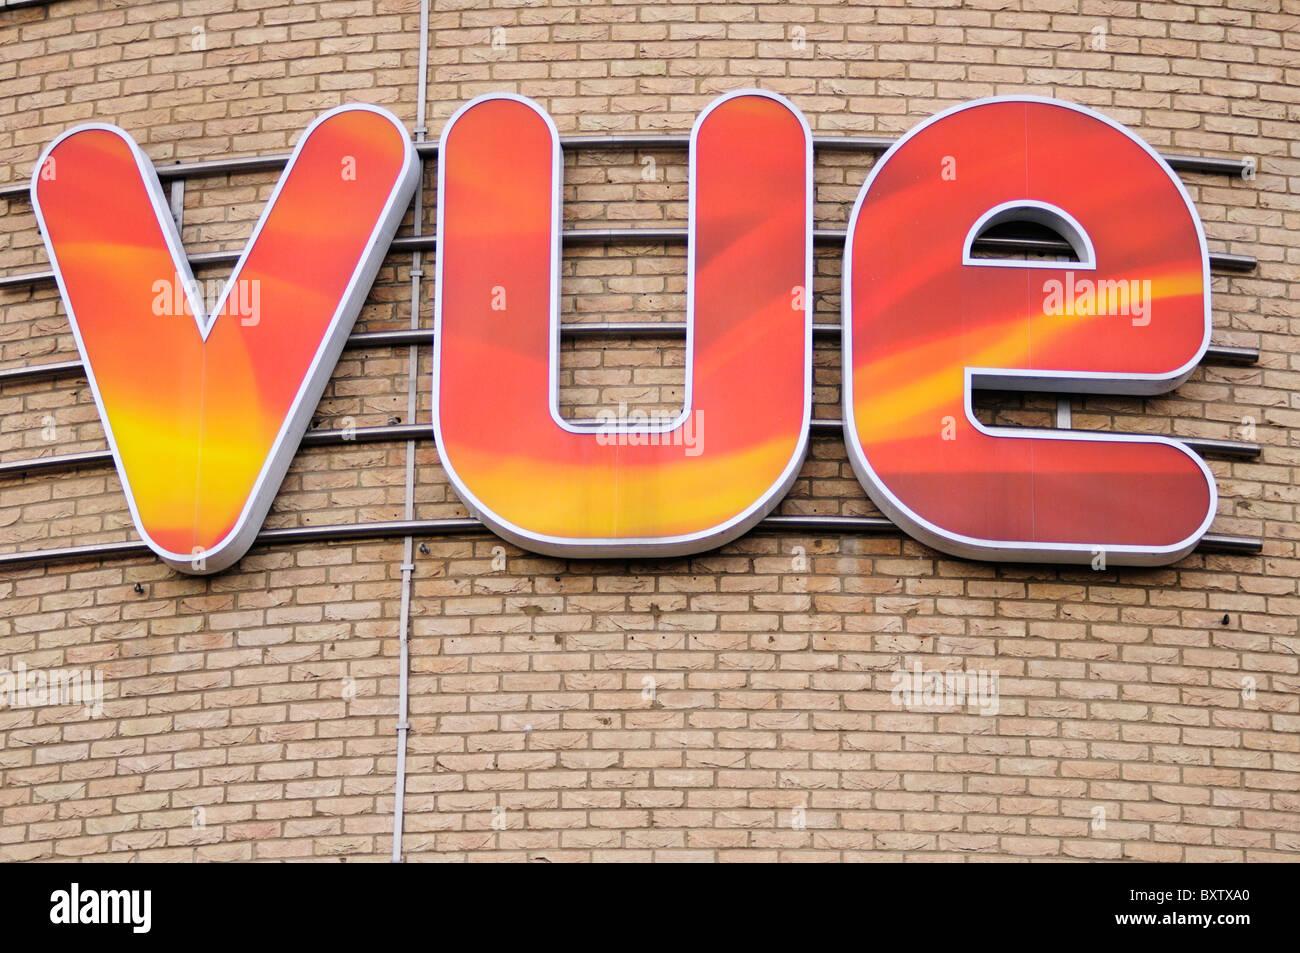 VUE cinema sign logo, Cambridge England, UK - Stock Image